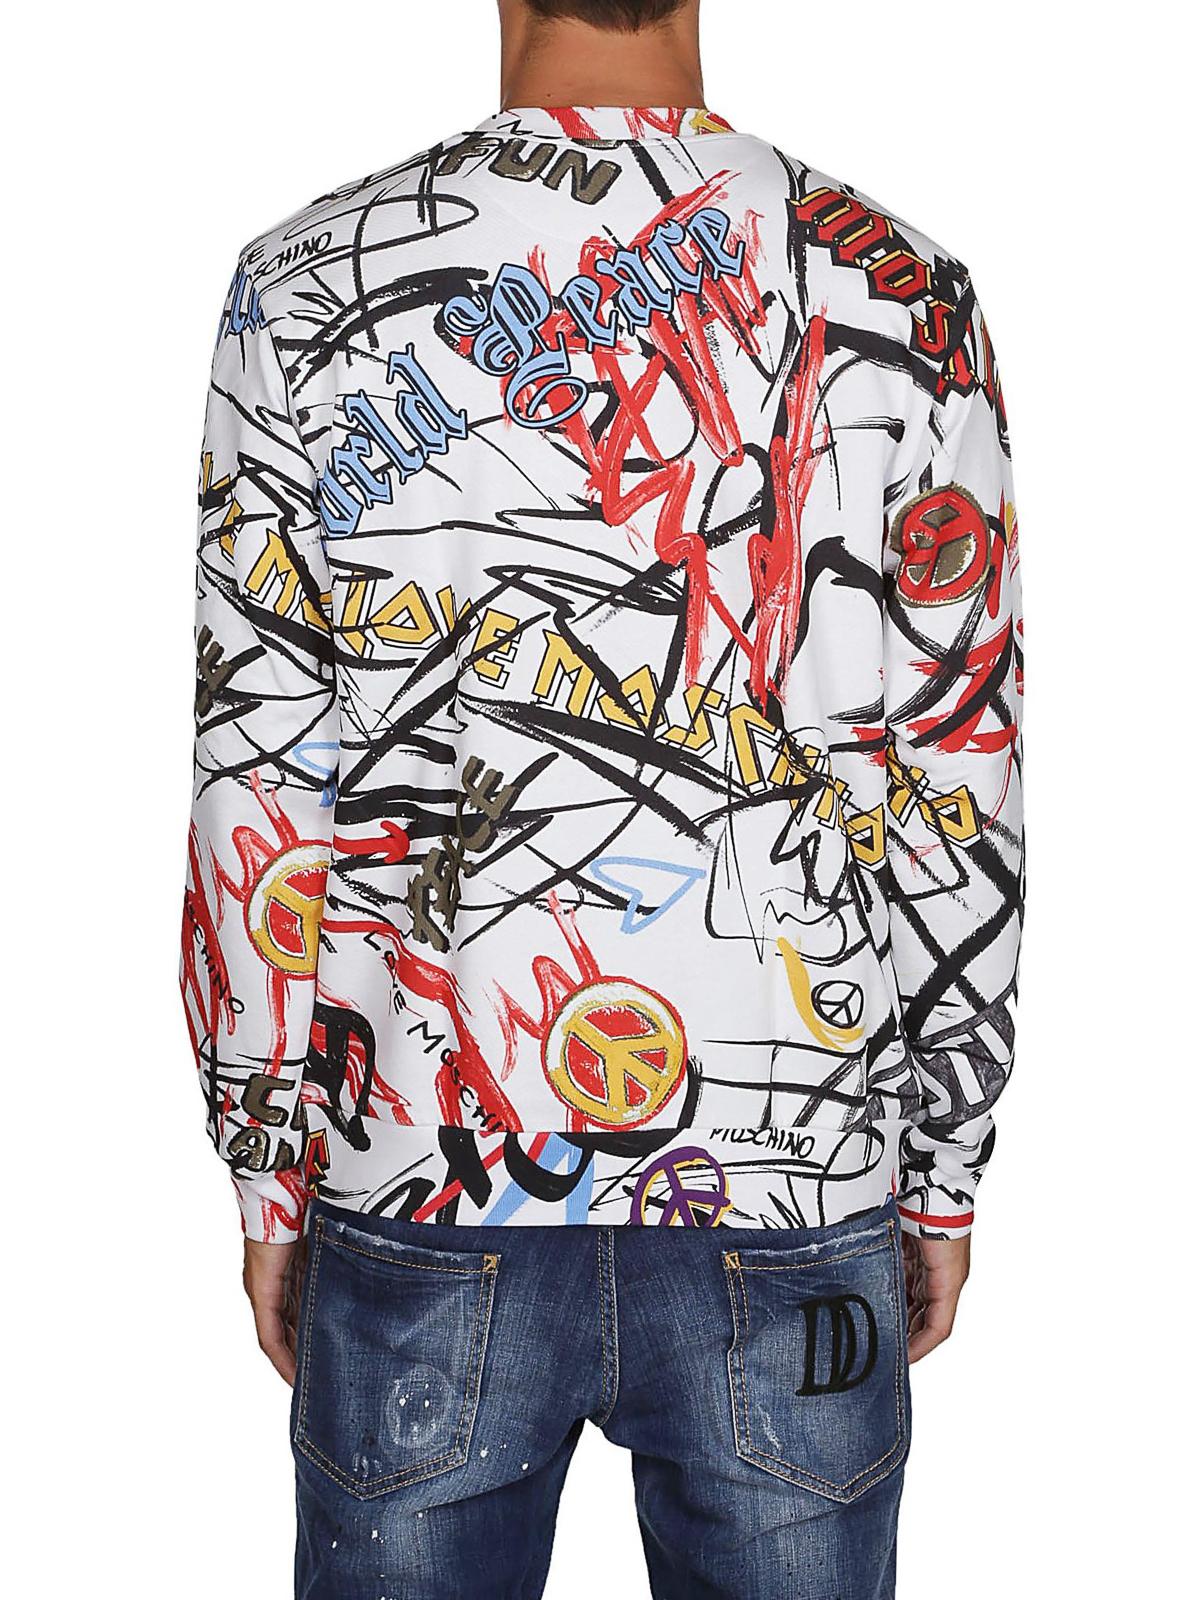 11cfece9 graffiti-print-sweatshirt-shop-online-love-moschino-00000140102f00s004.jpg